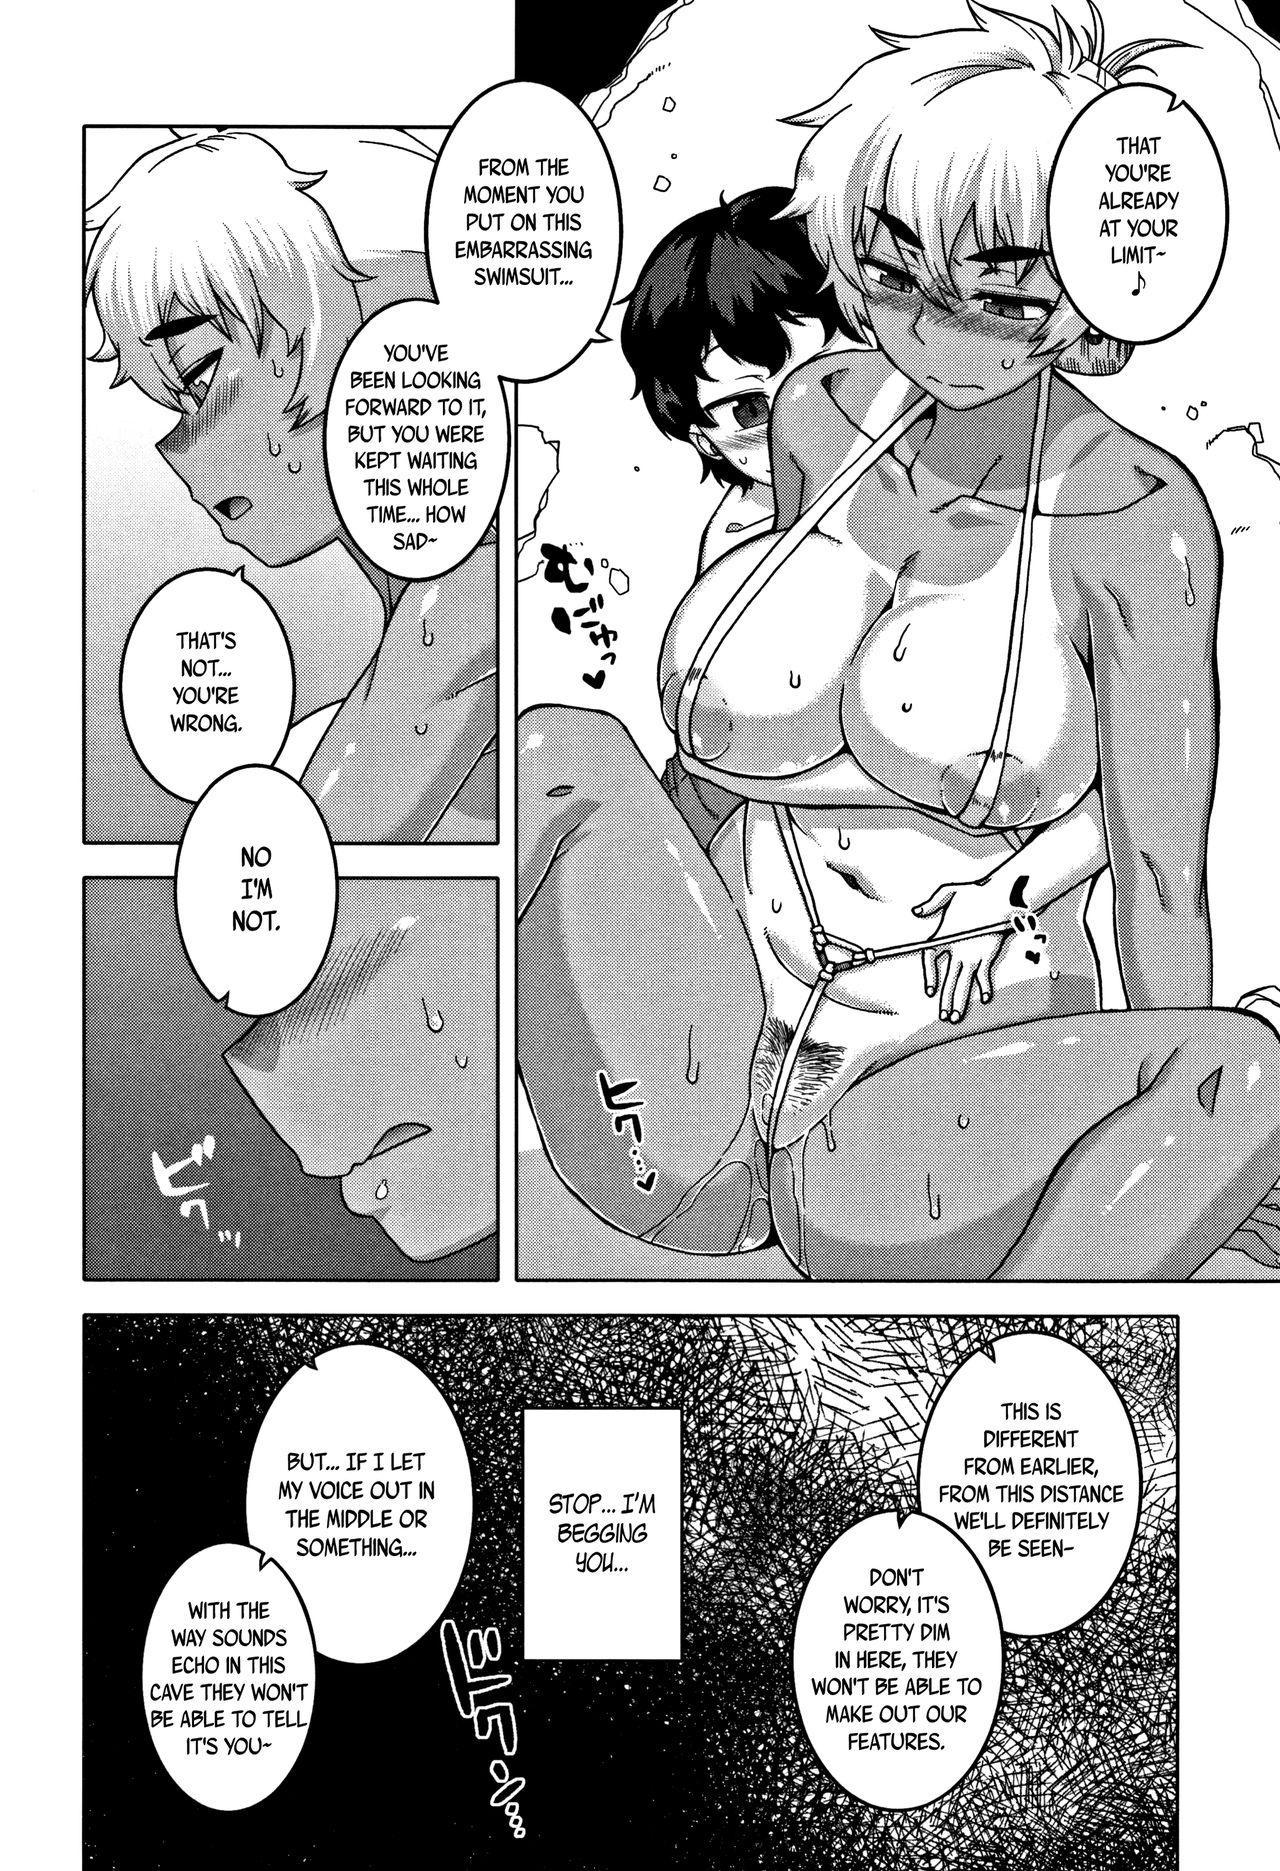 [Takatsu] Hitozuma A-san to Musuko no Yuujin N-kun - Married wife A and son's friend N-kun Ch. 1-3 [English] 60